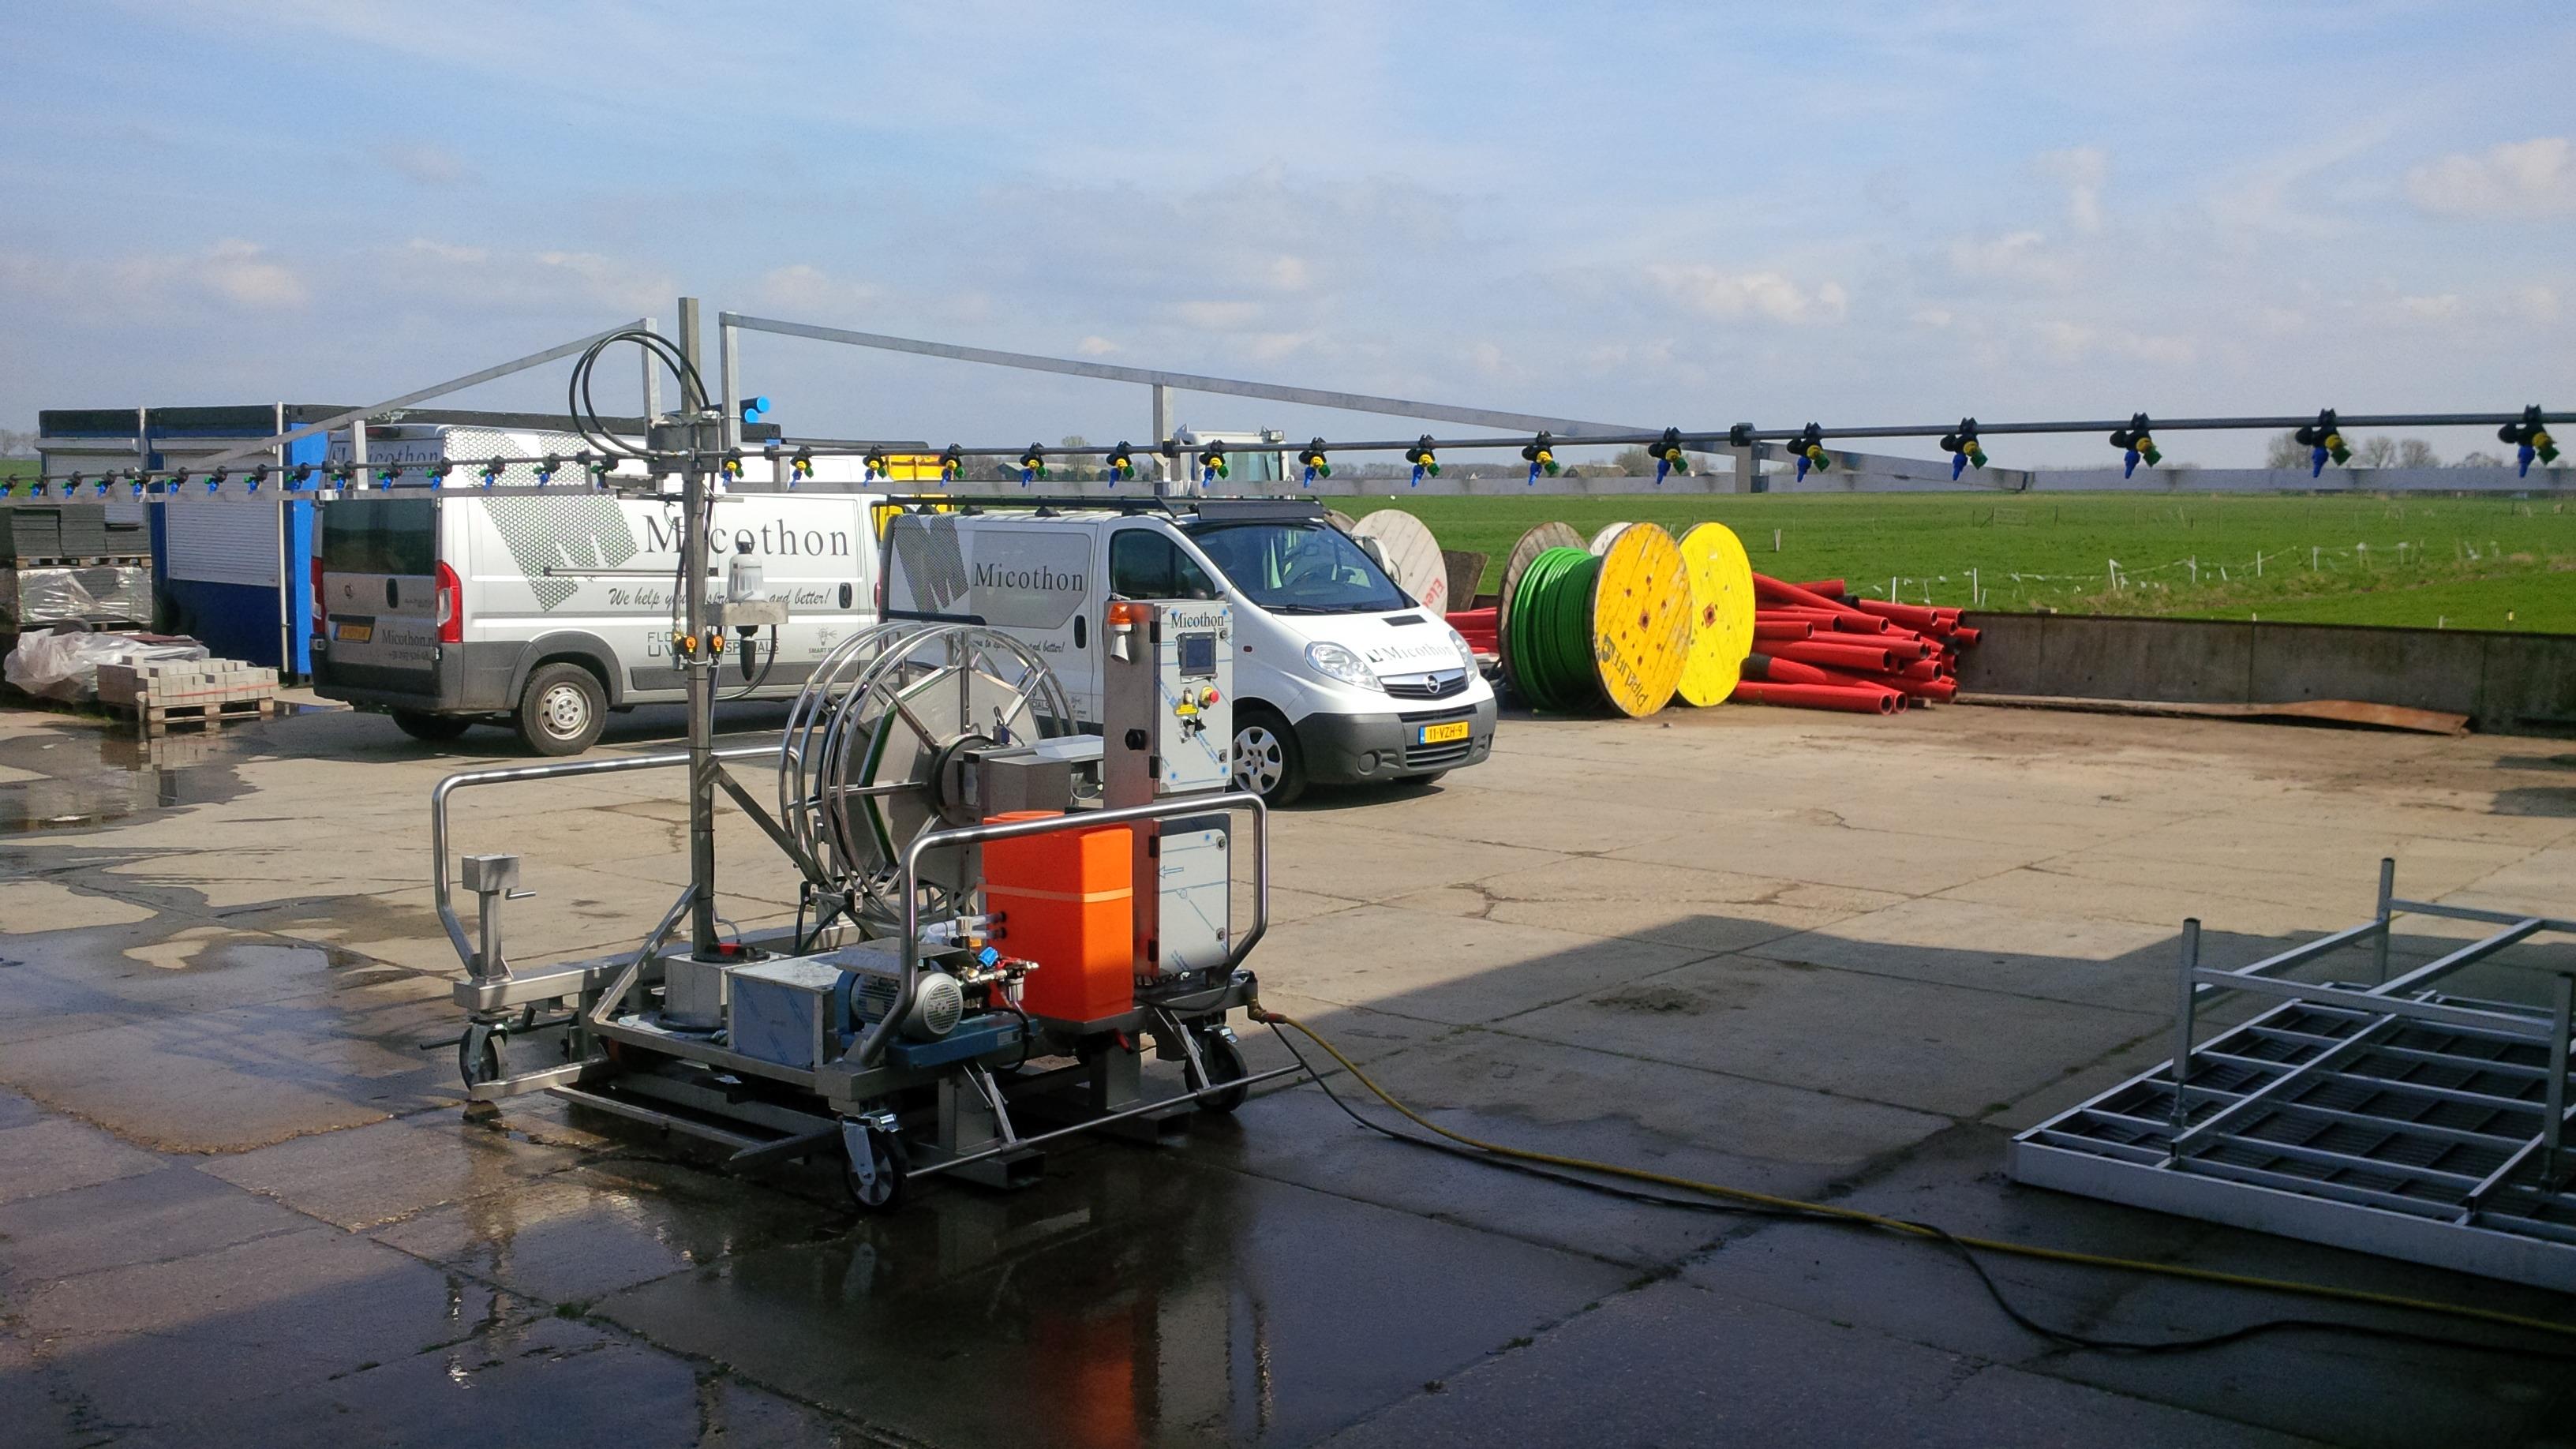 Micothon 12 m wide spraying robot